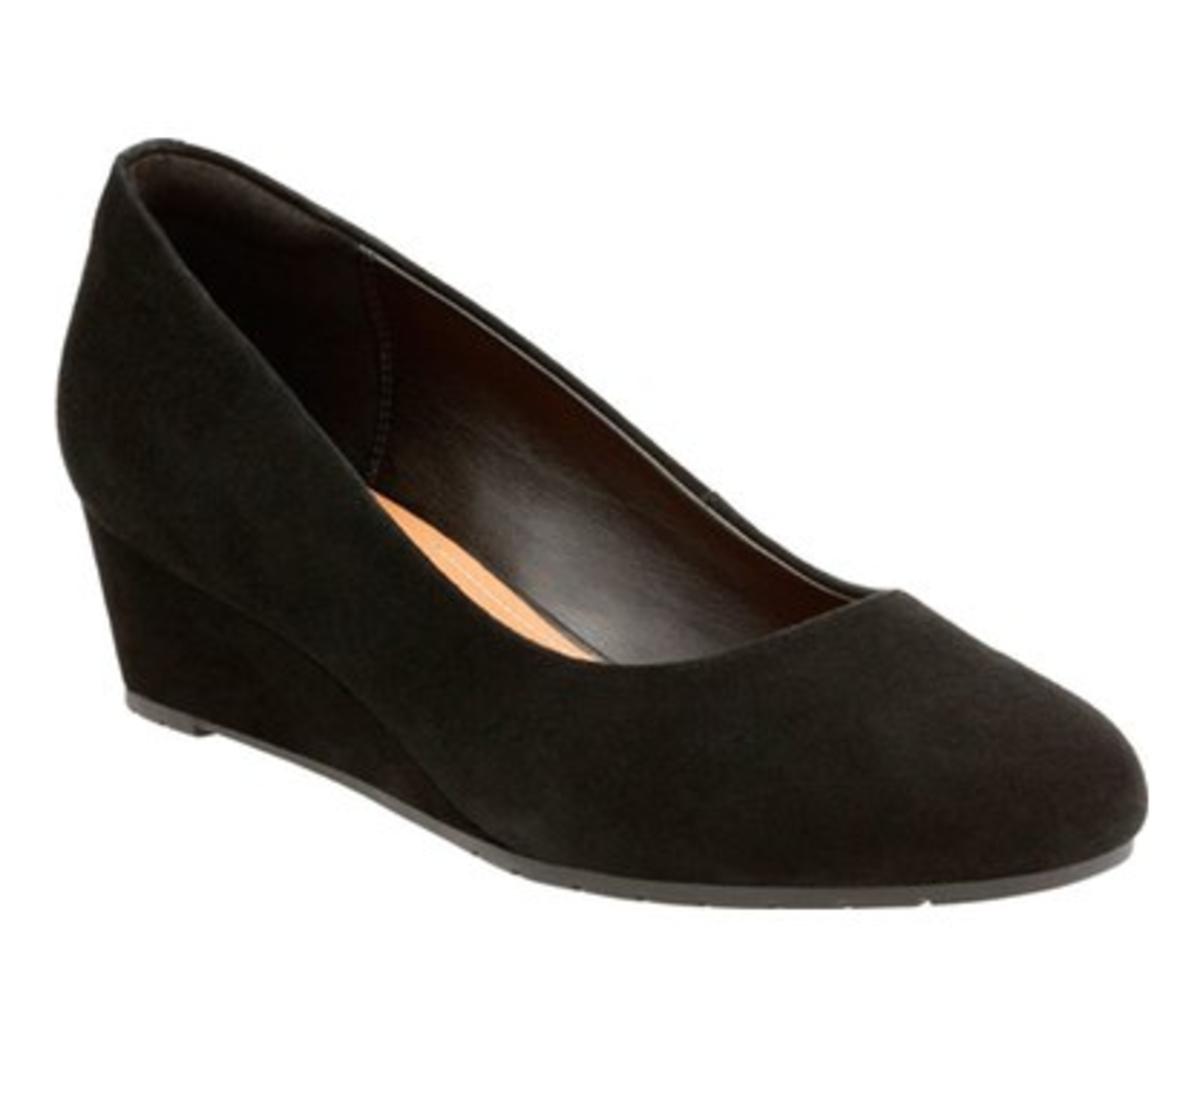 black suede wedge pumps. 1.5 inch heel